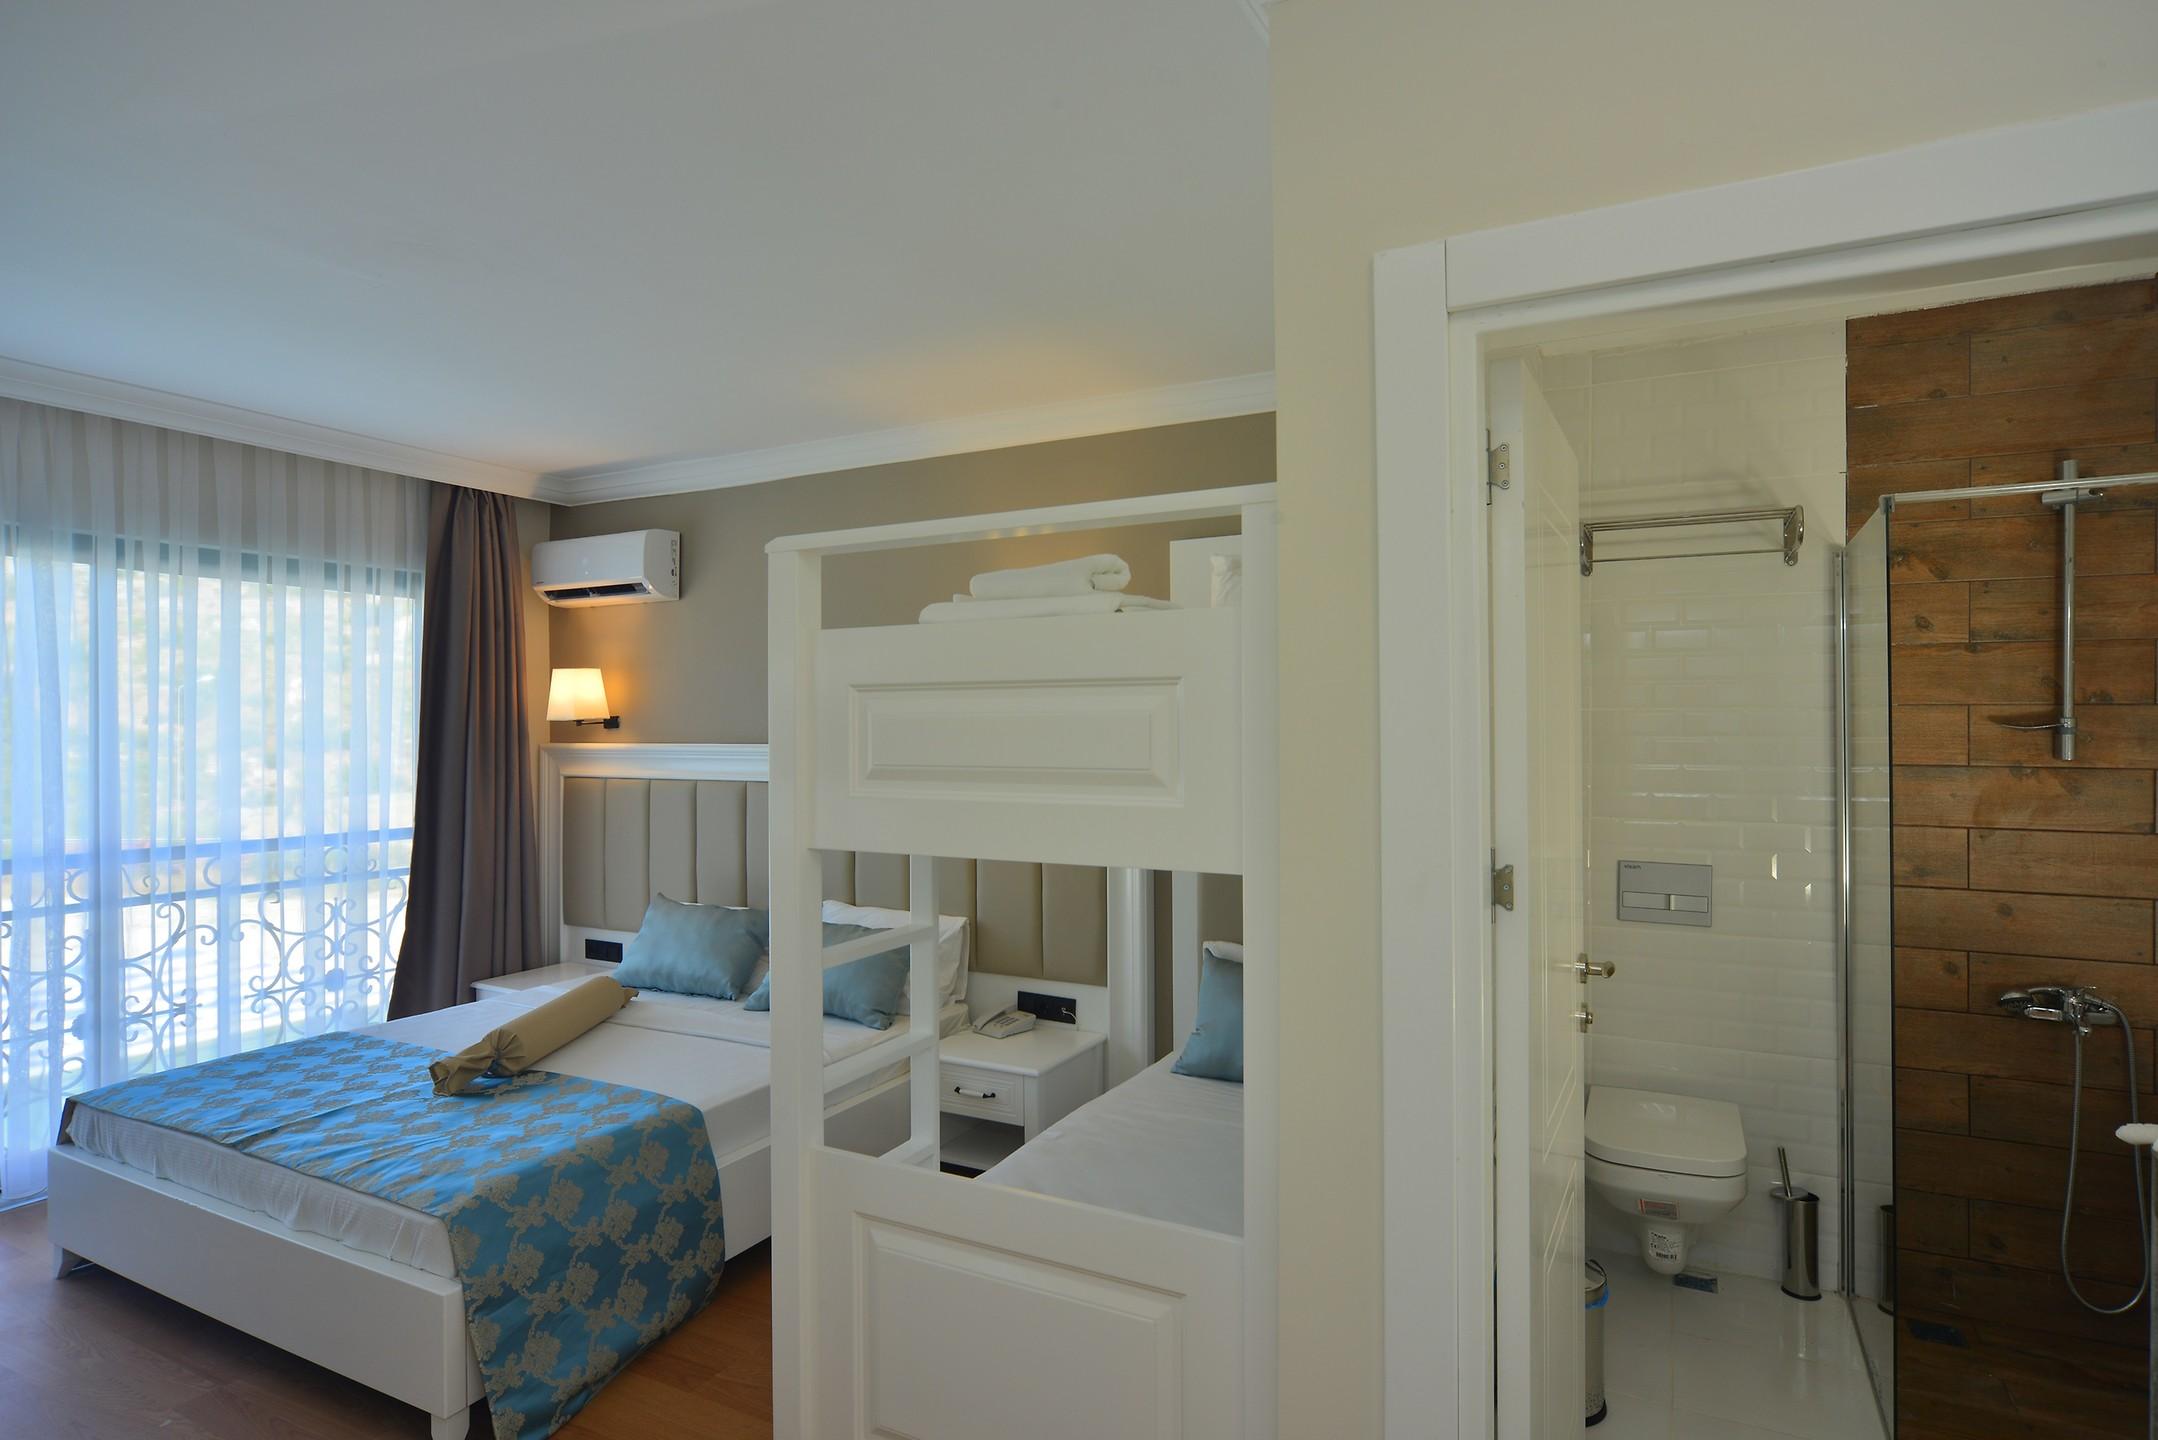 SEA STAR HOTEL261938